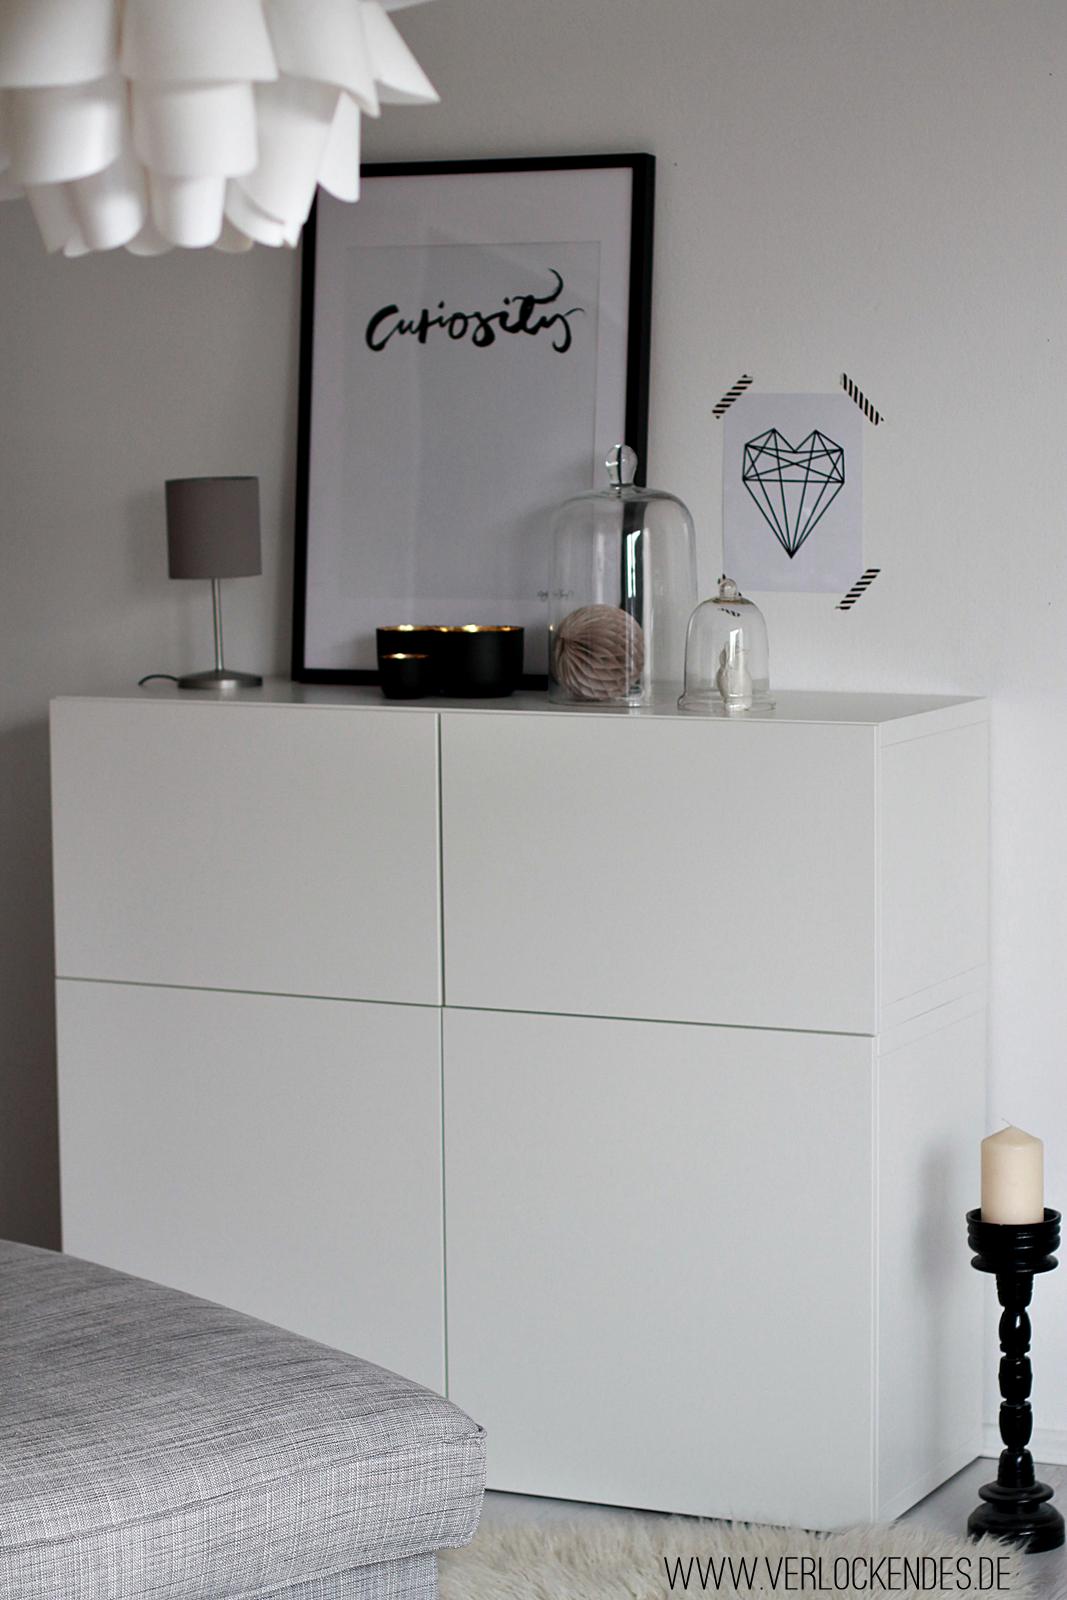 Unser neues Wohnzimmer! | Wohnzimmer, Wohnzimmer dekor ...